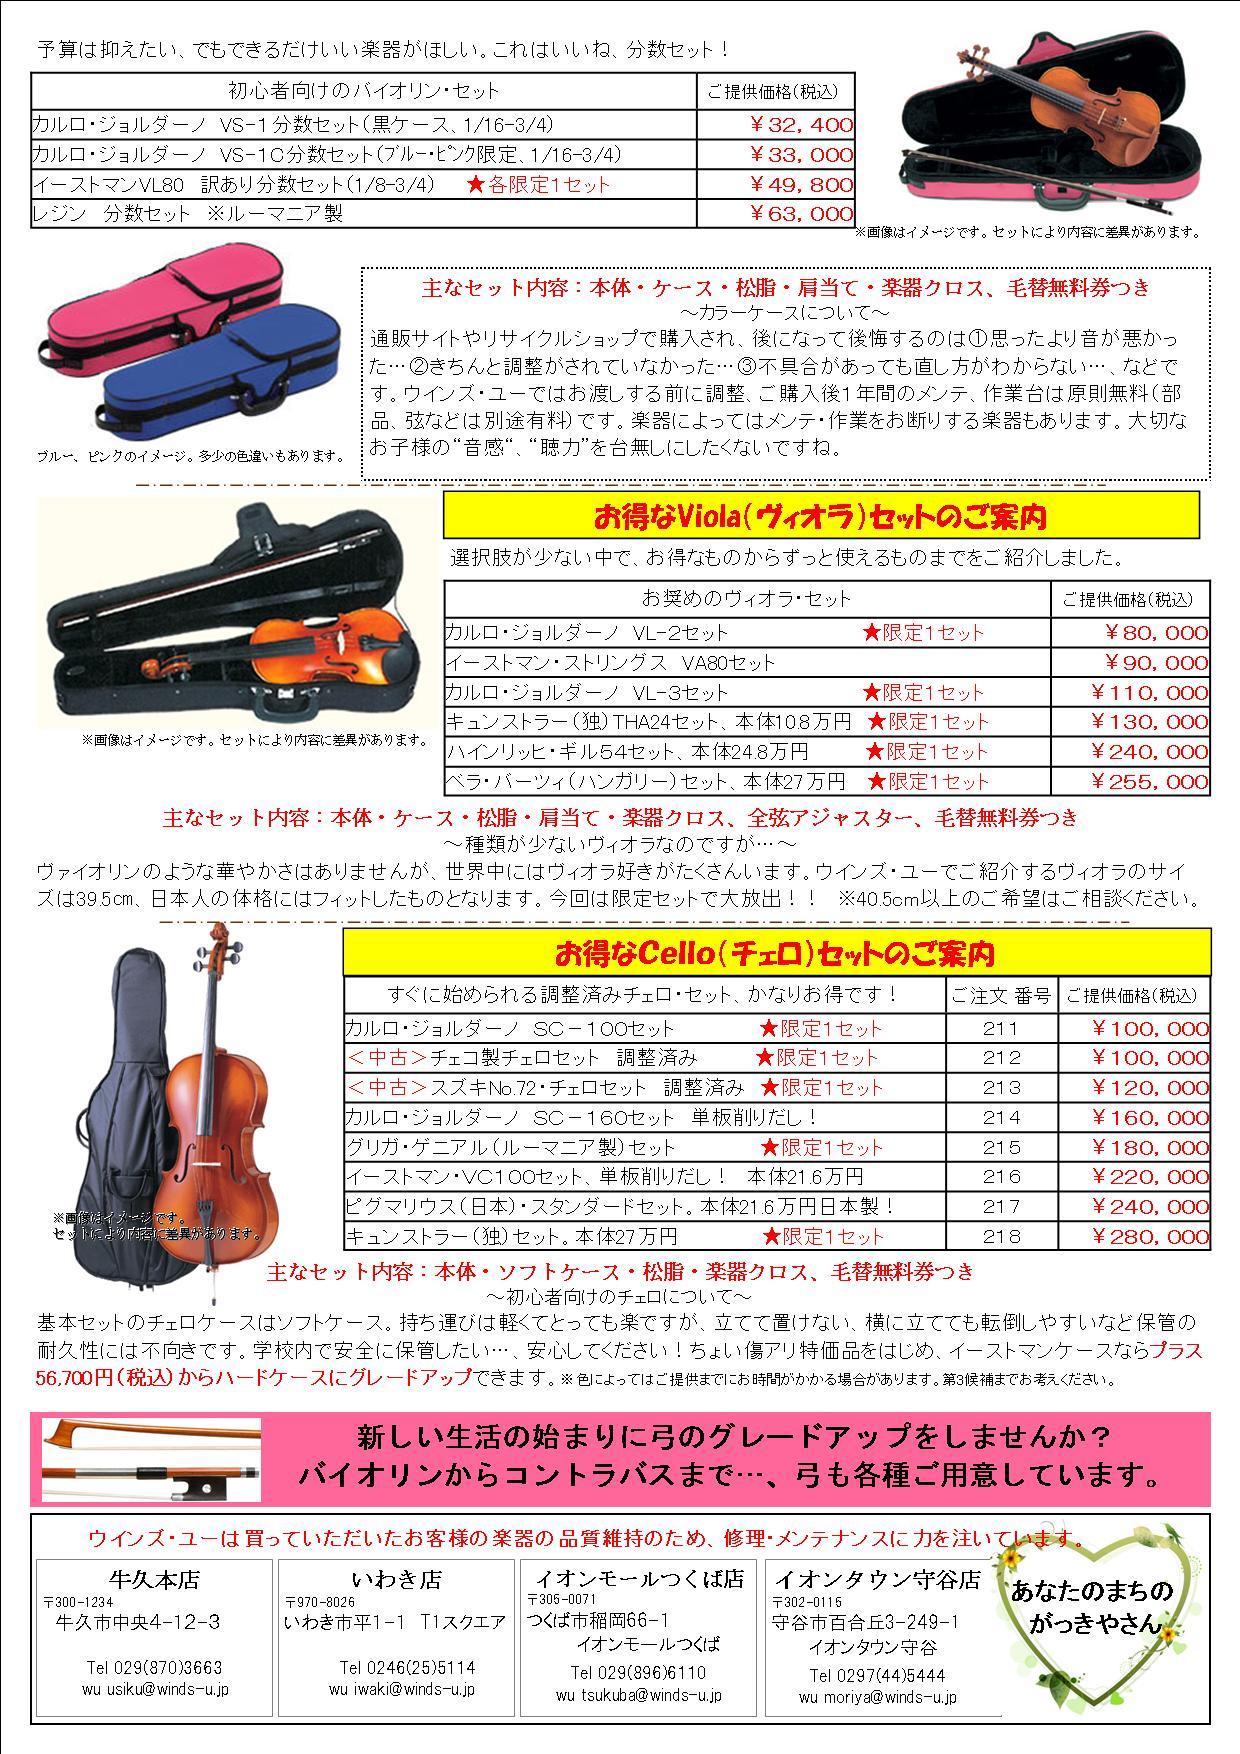 弦楽器学割フェア2016(裏)